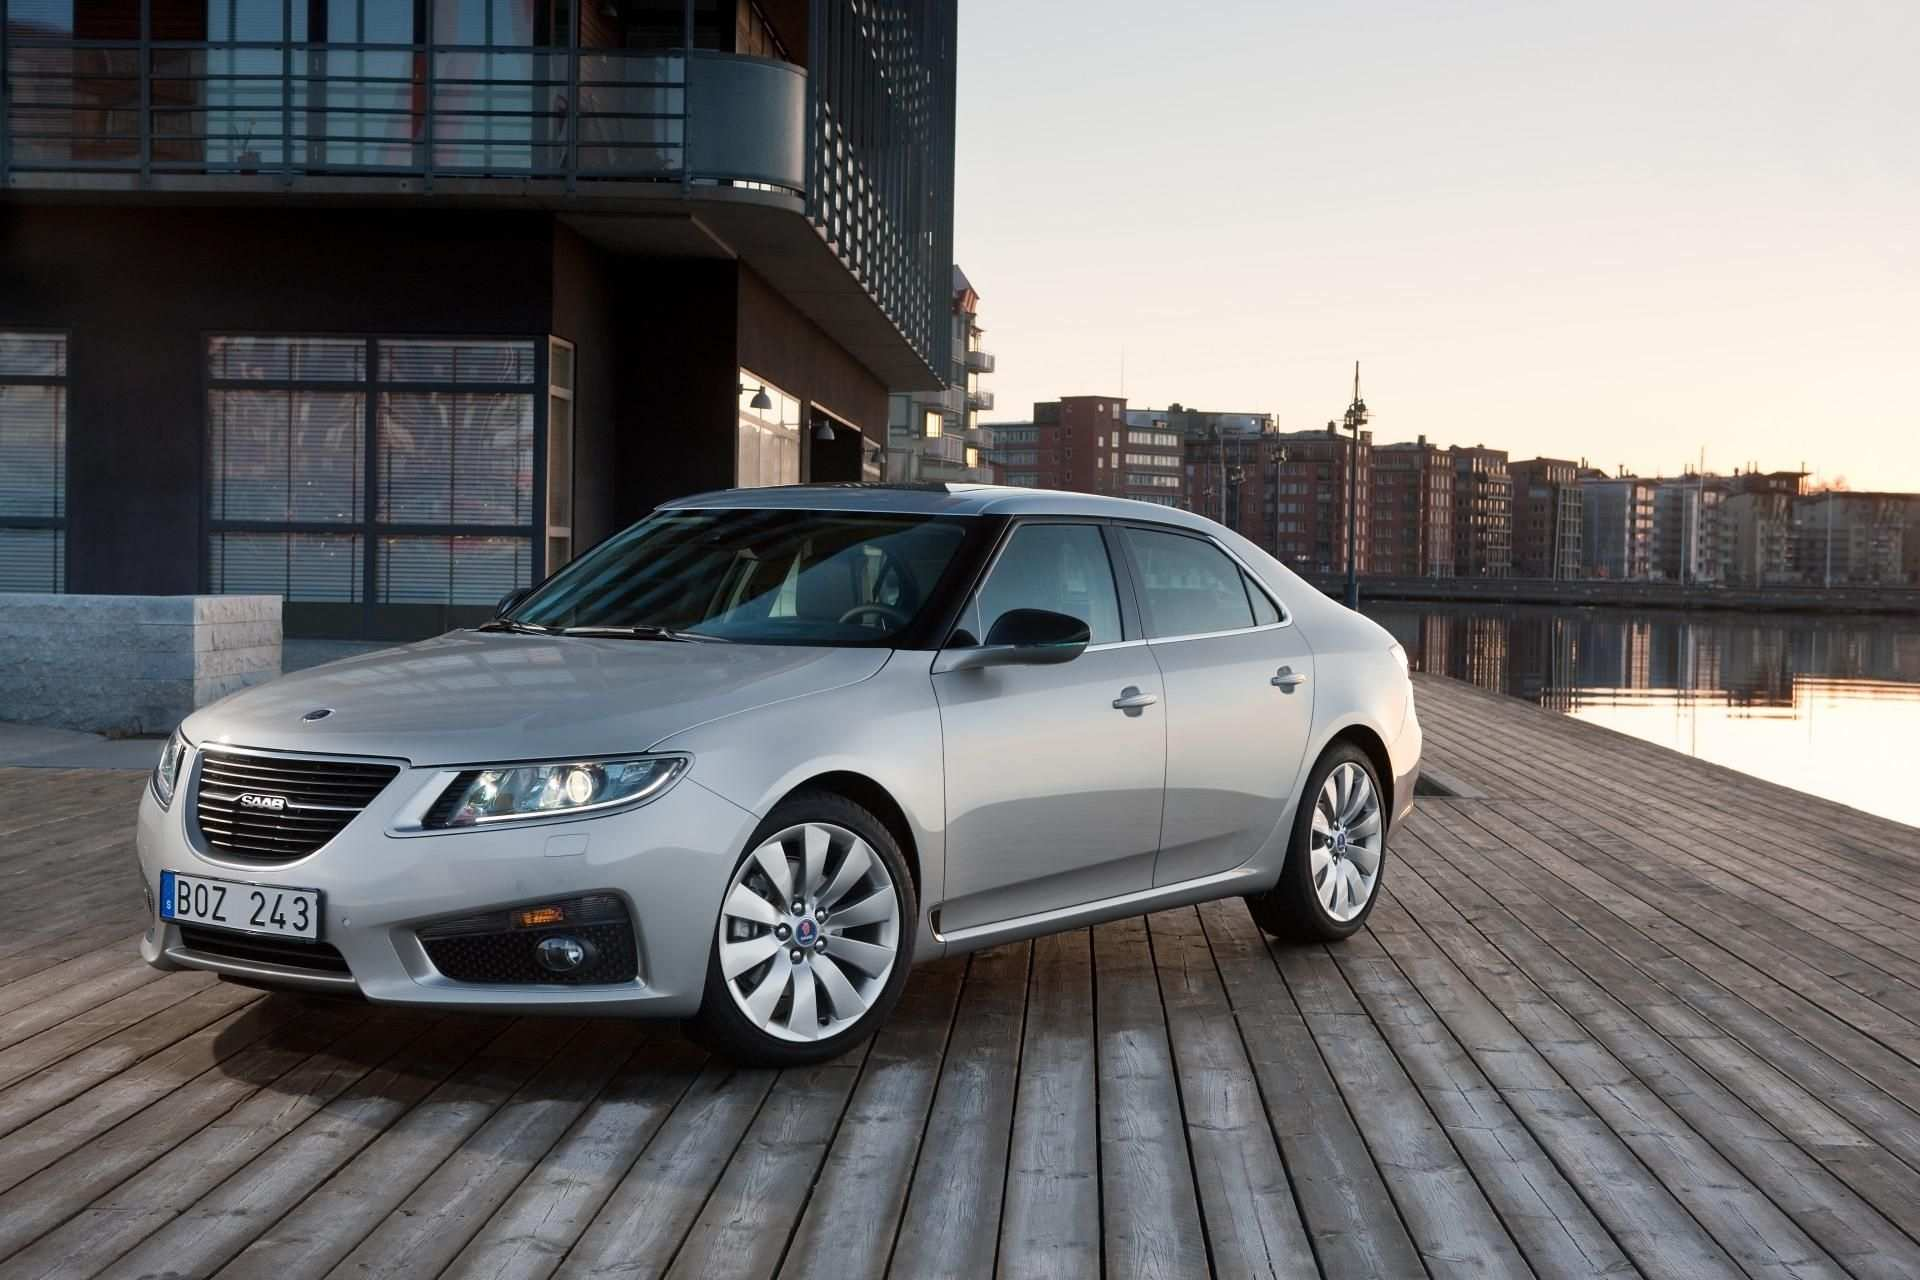 64 Great 2020 Saab 9 5 Performance with 2020 Saab 9 5